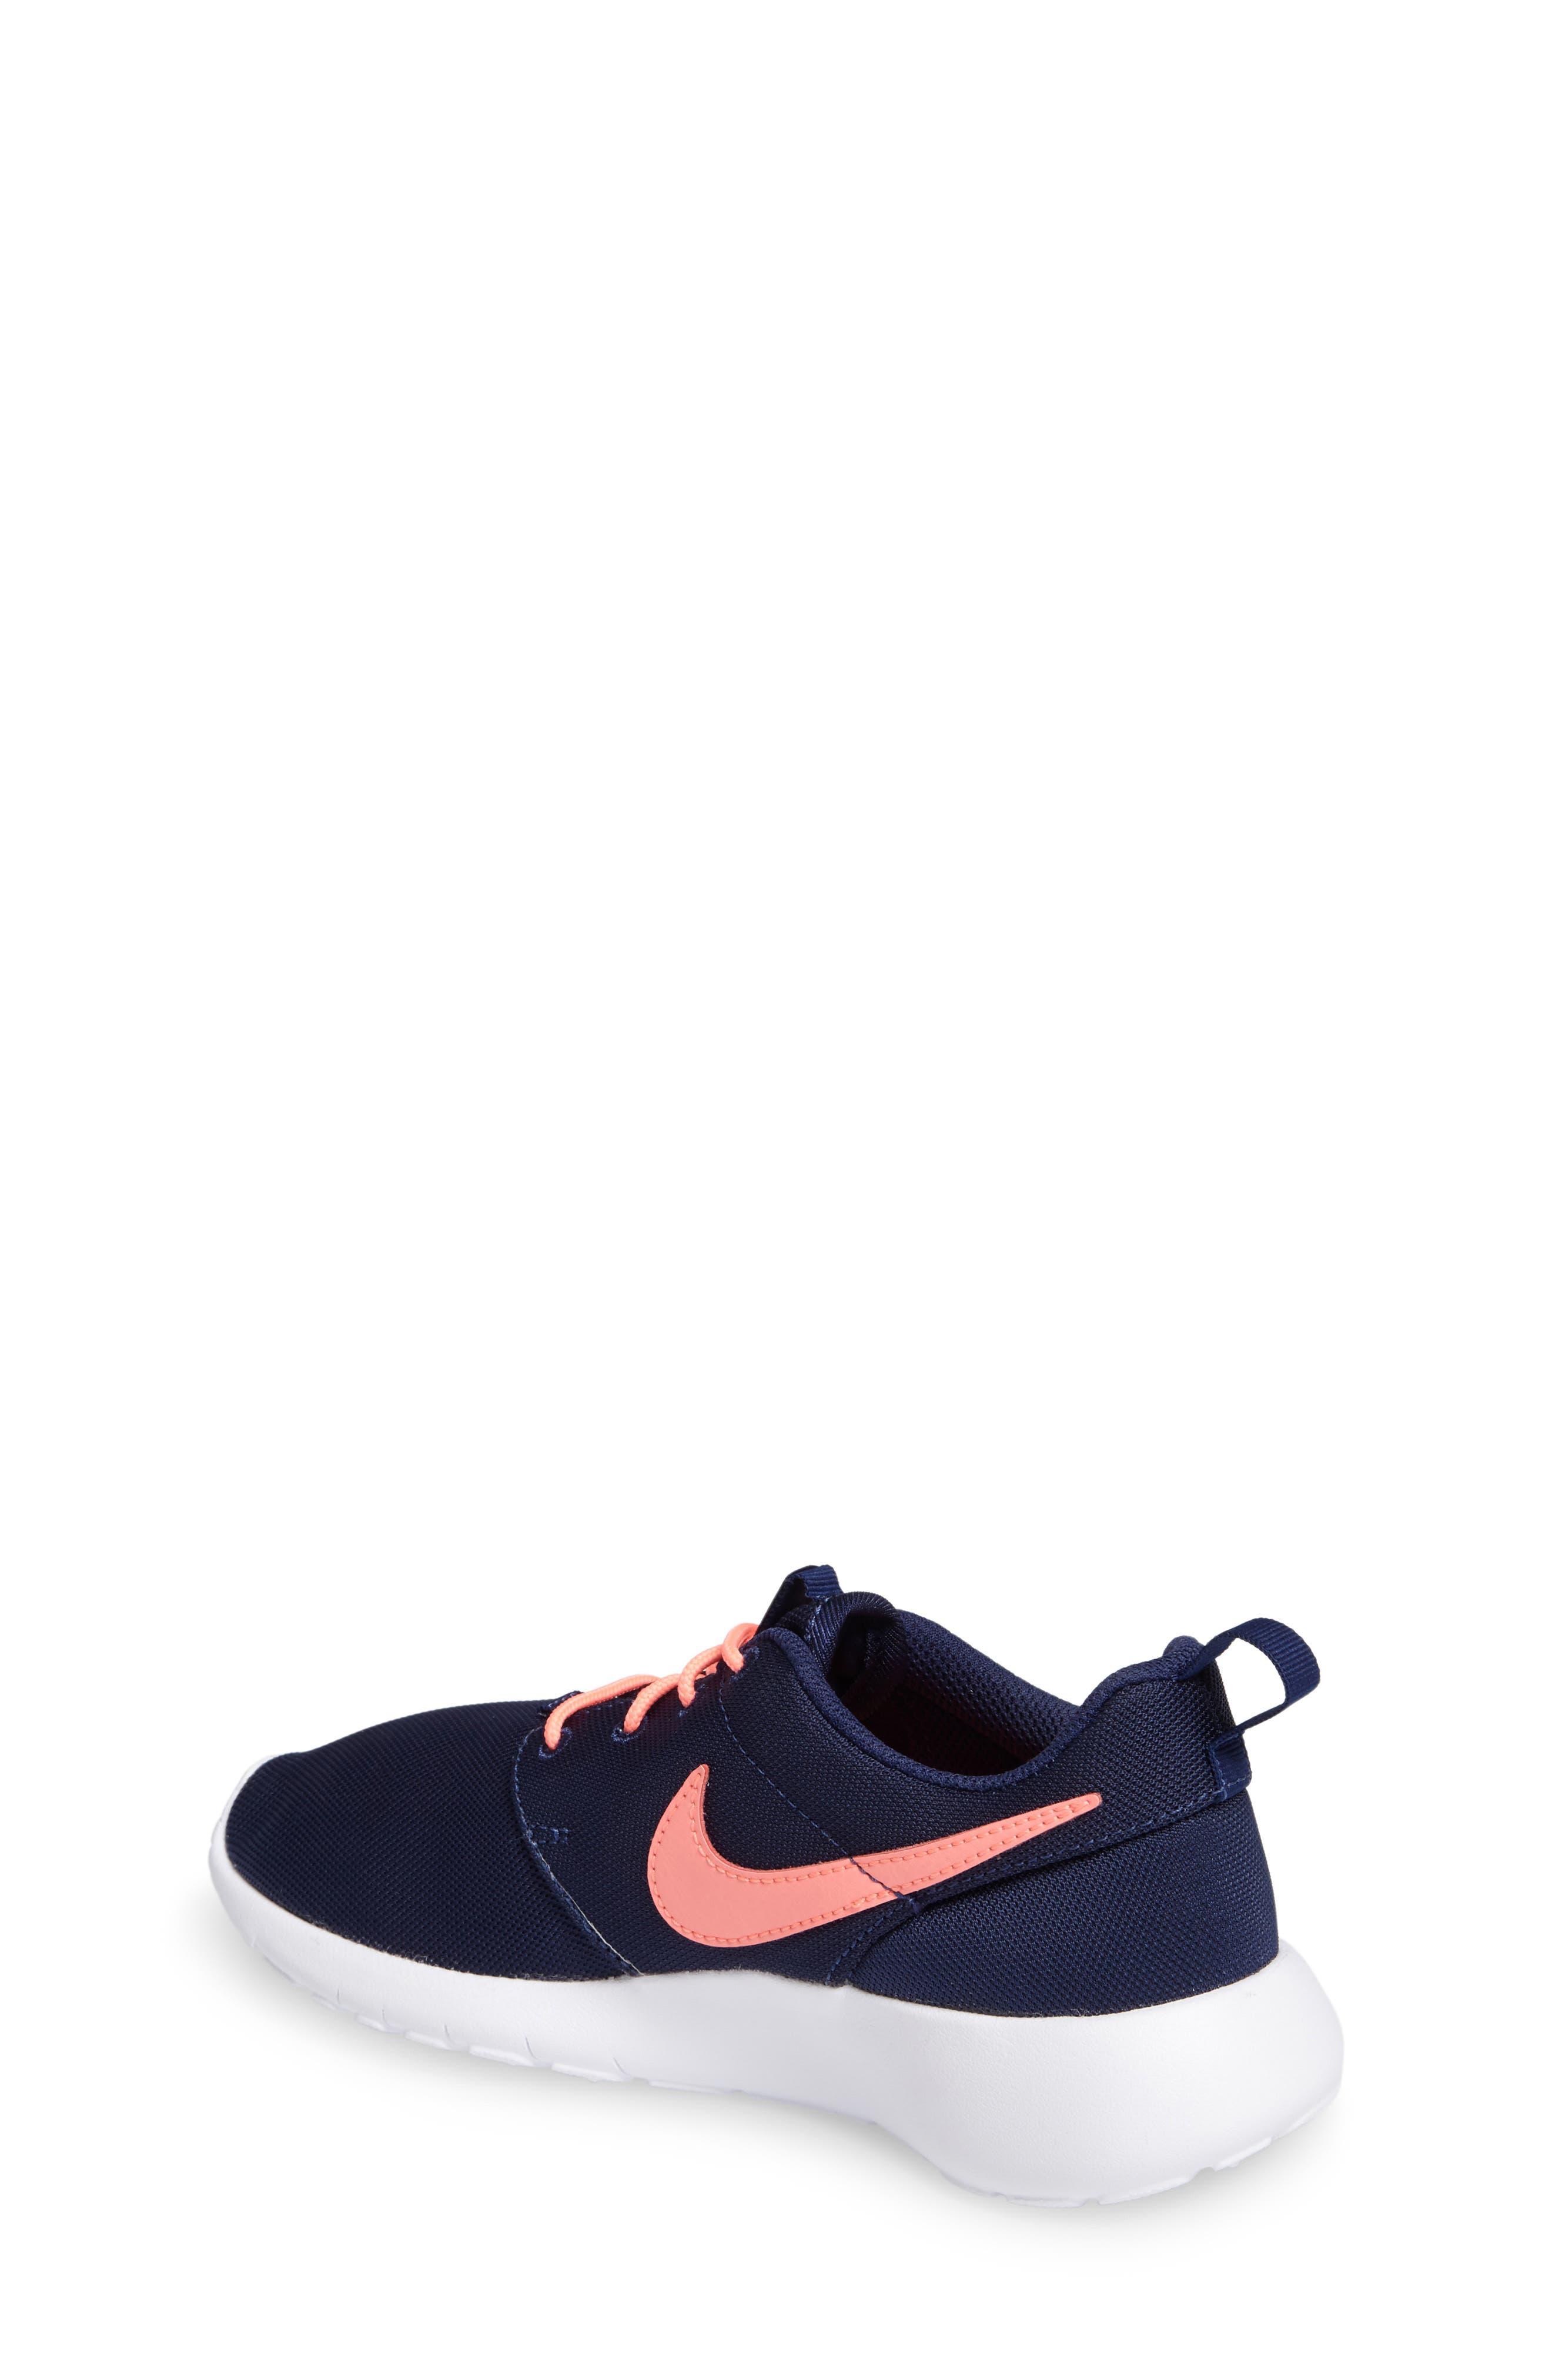 'Roshe Run' Athletic Shoe,                             Alternate thumbnail 93, color,